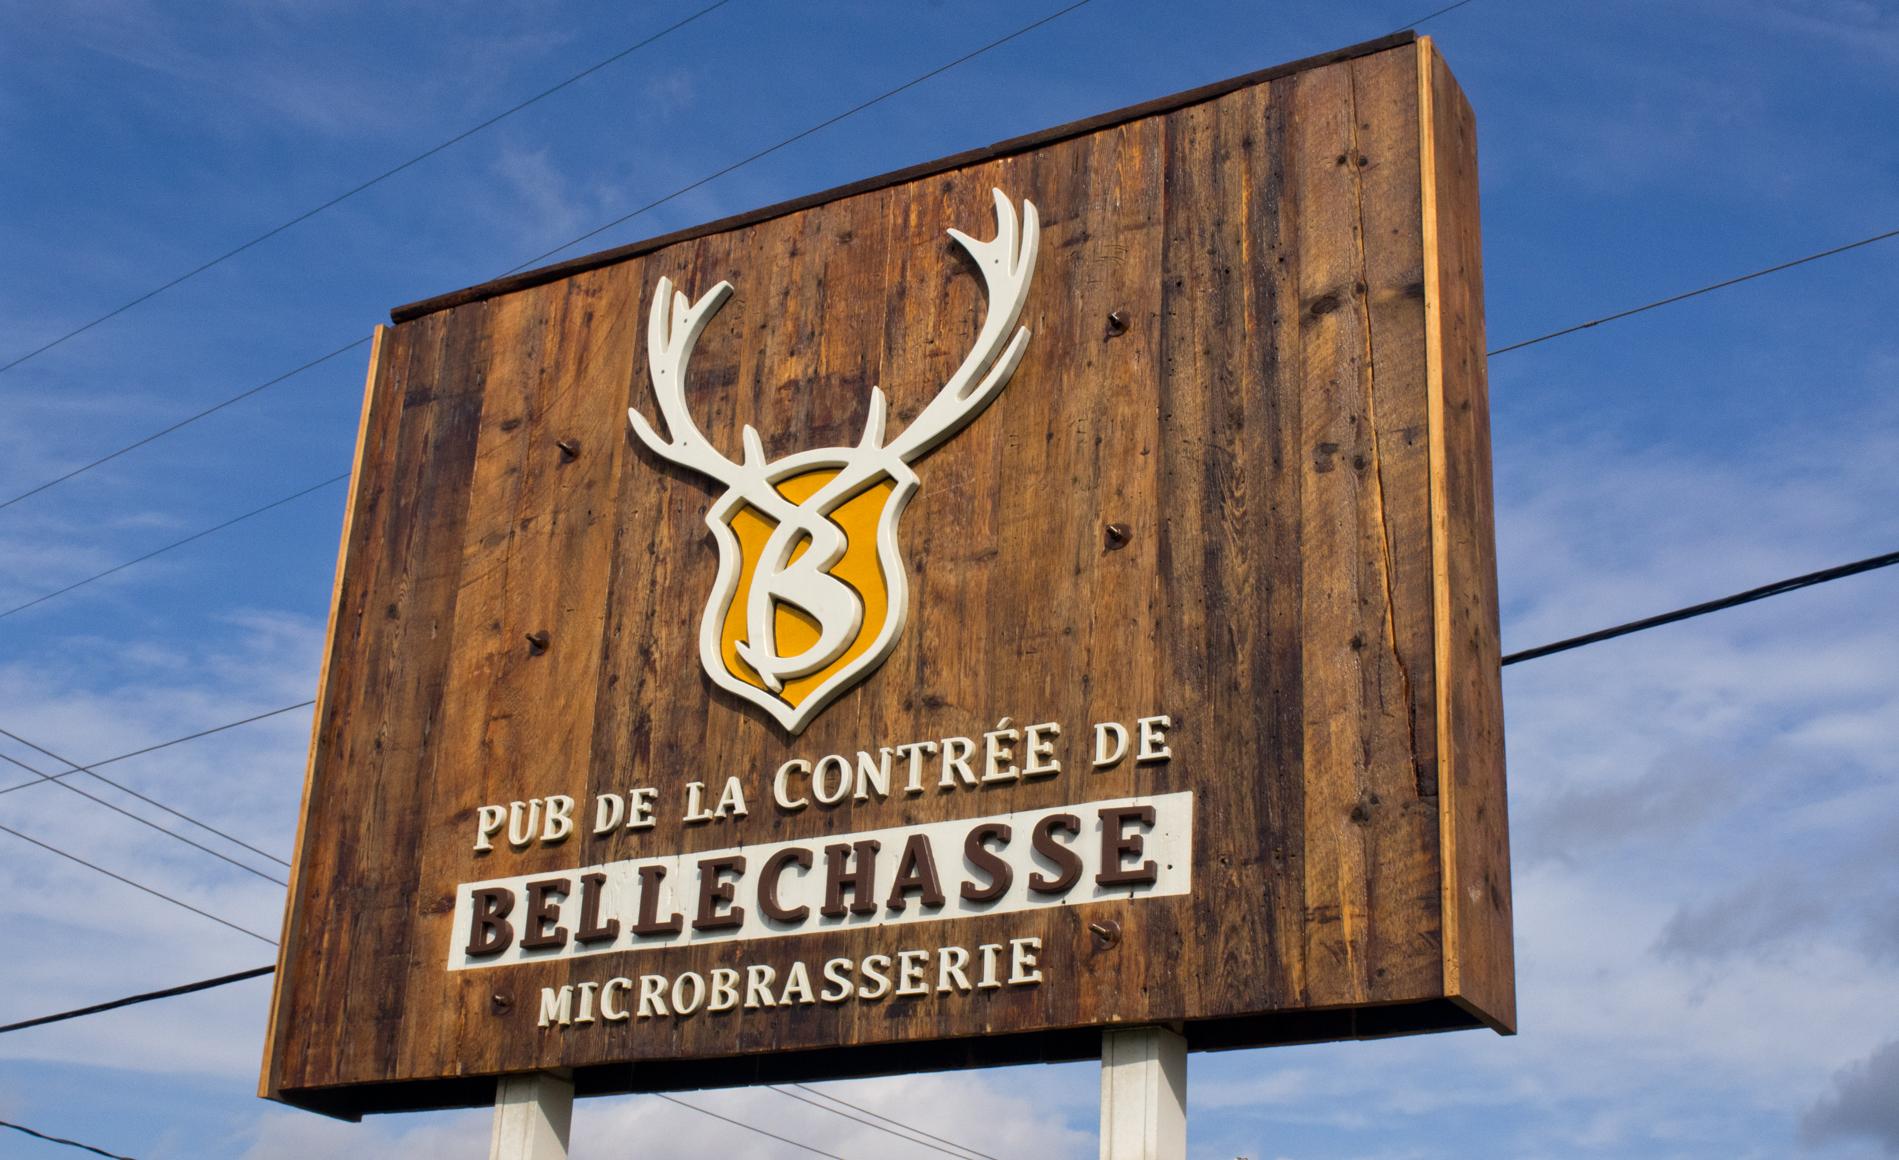 MICROBRASSERIE DE BELLECHASSE